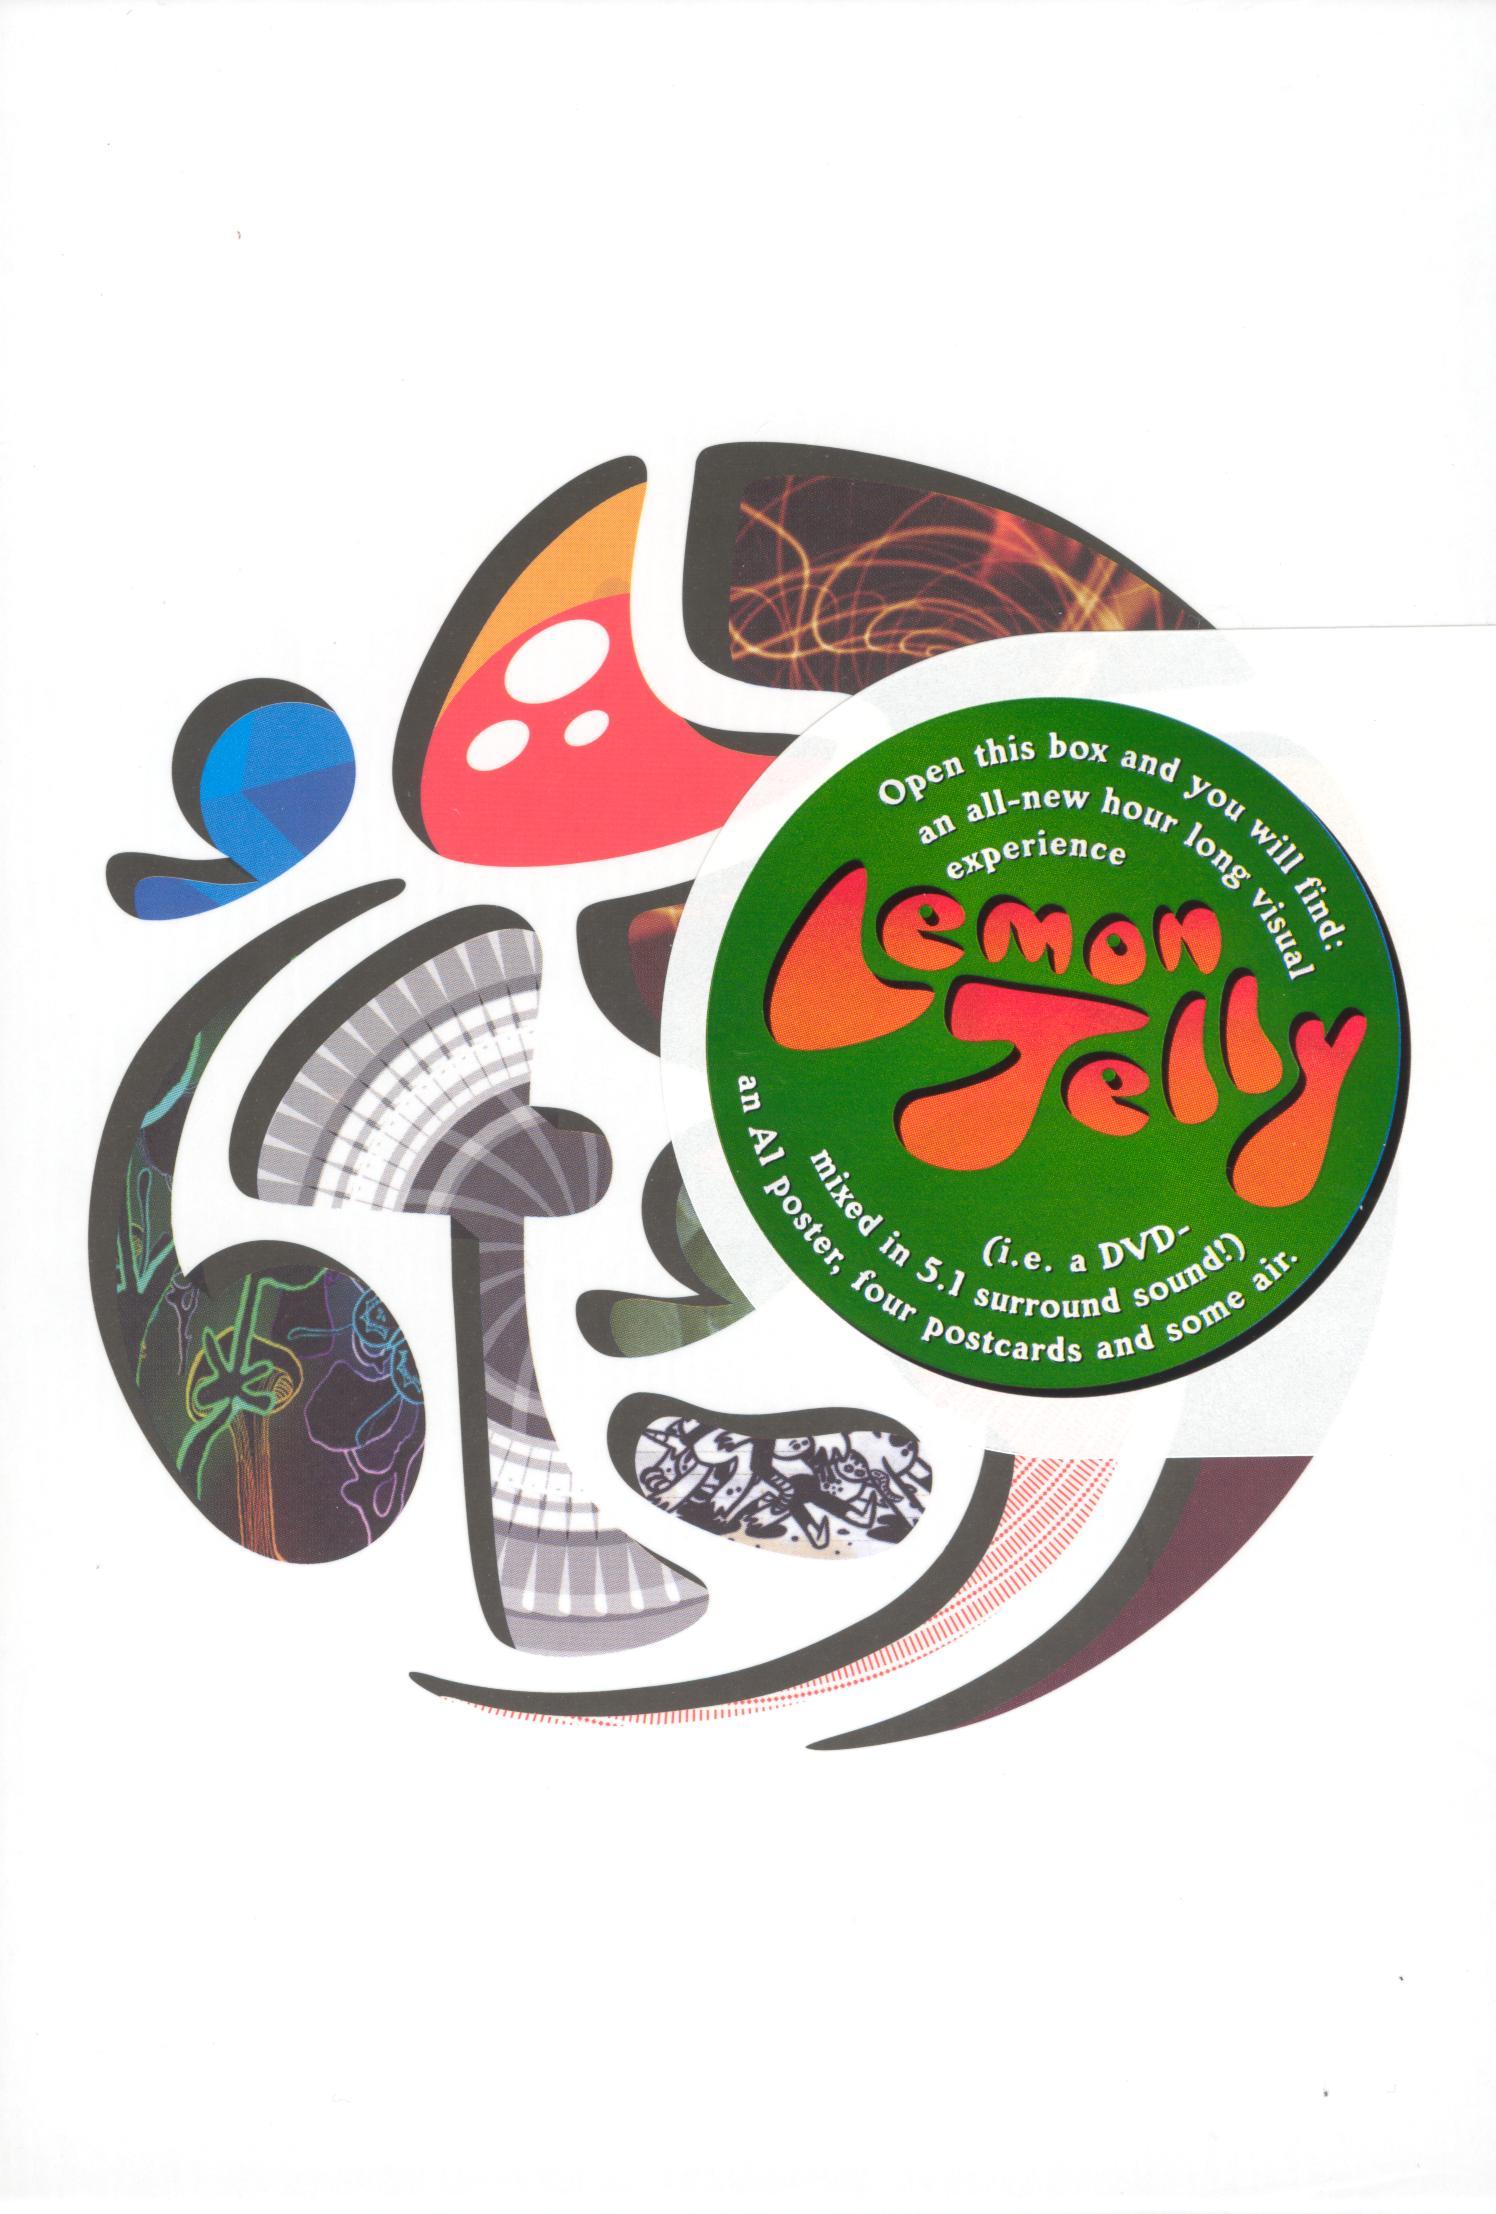 Lemon Jelly: 64-95